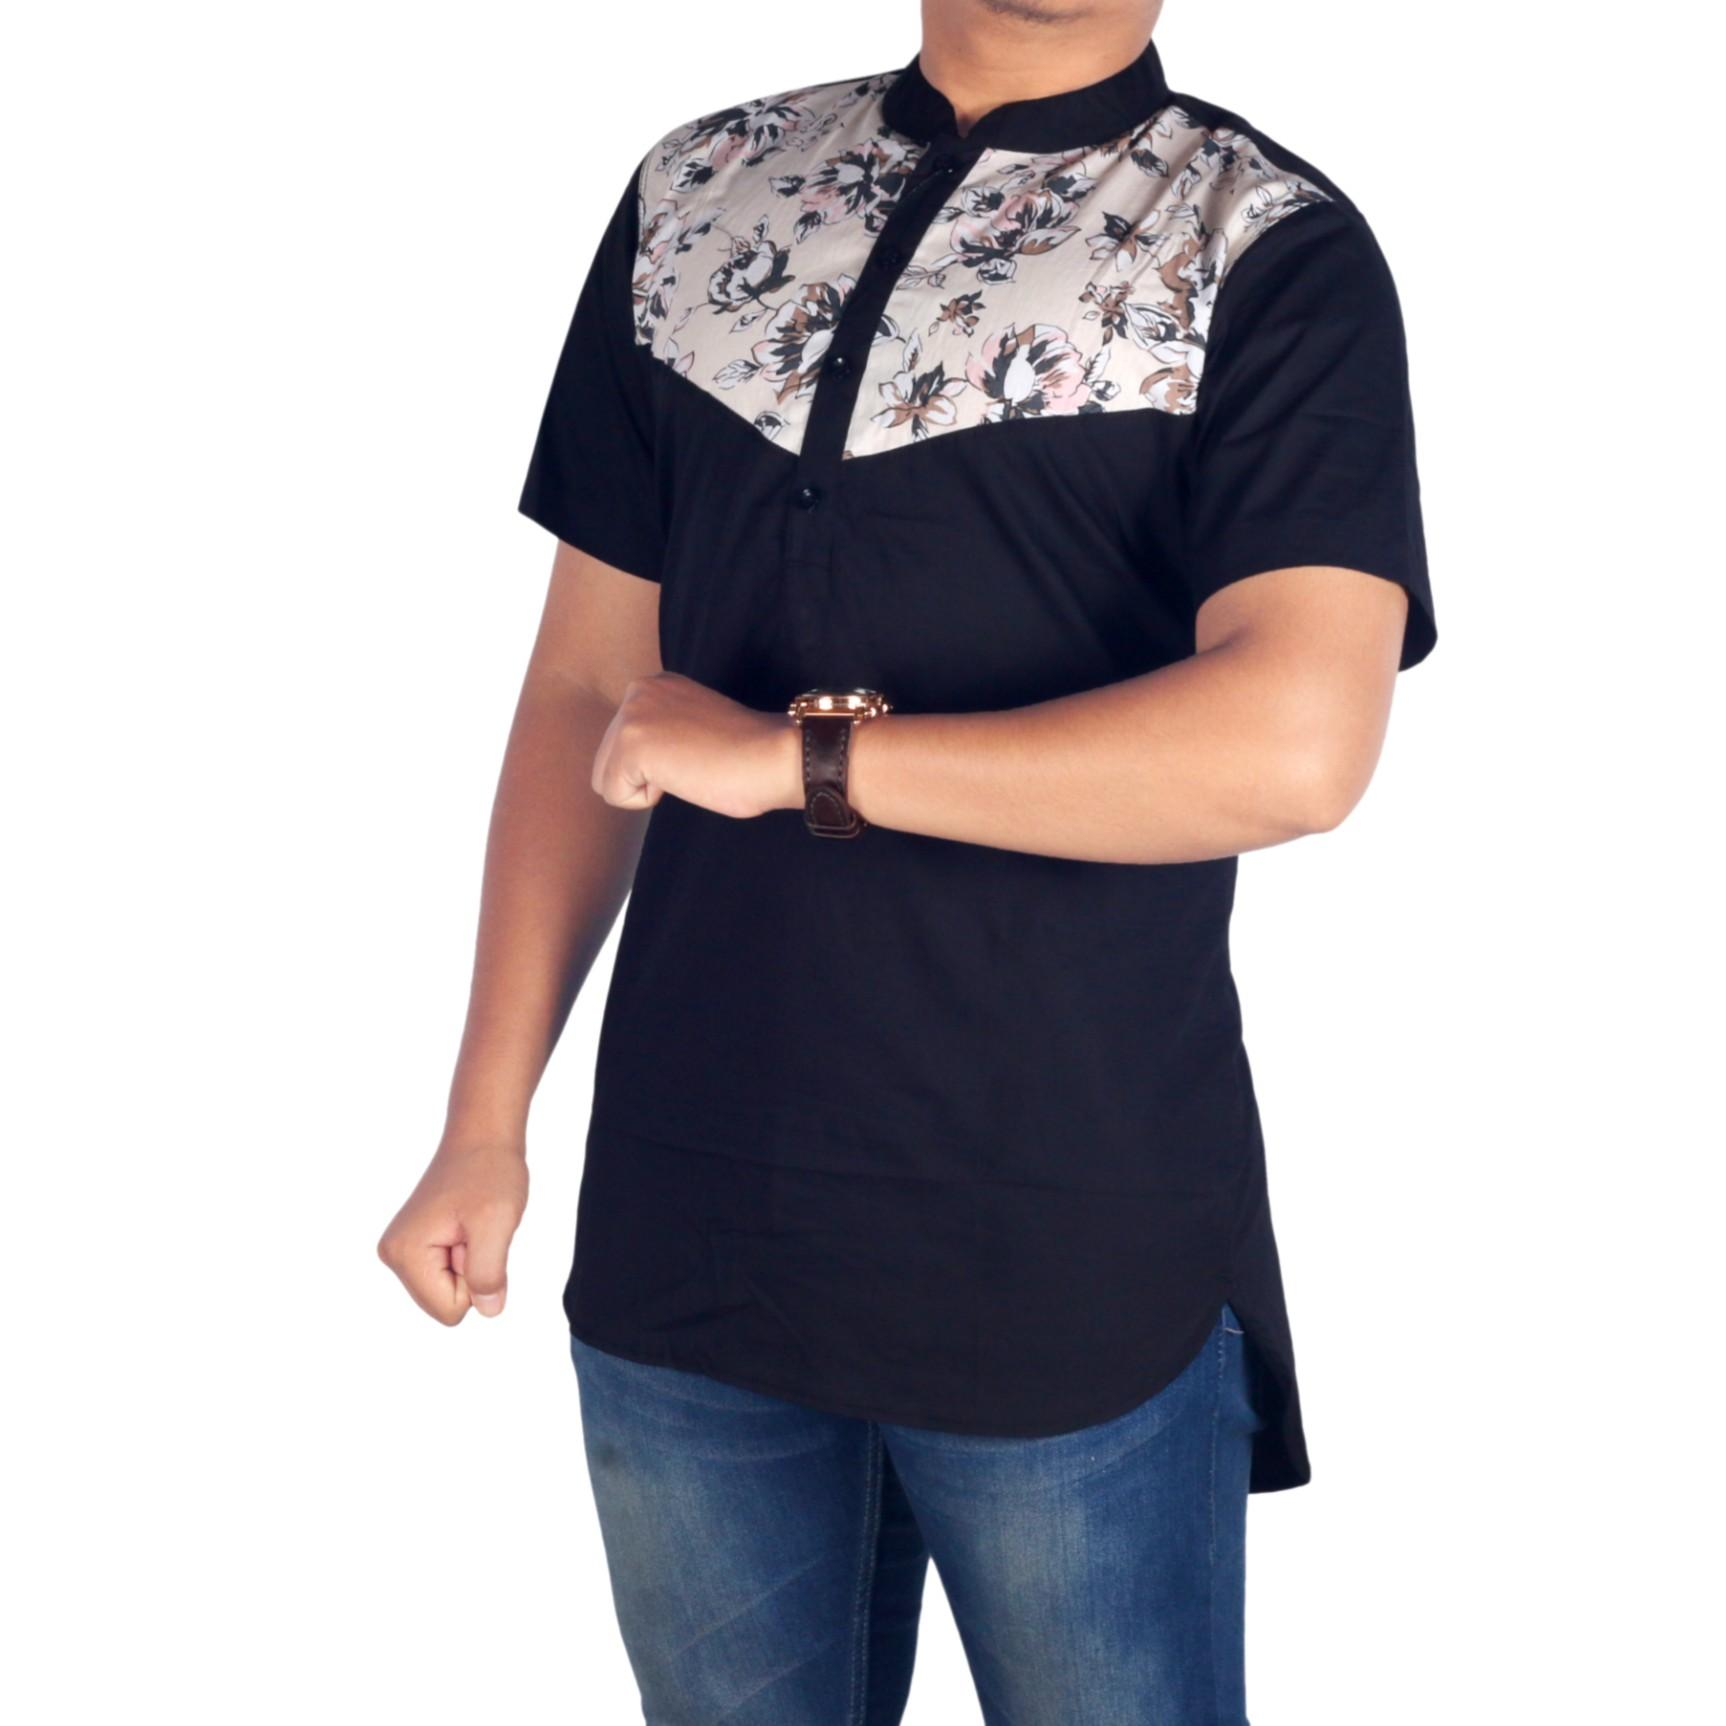 Kelebihan Bsg Fashion1 Baju Kemeja Pria Slimfit Lengan Panjang Canewood Flanel Ls